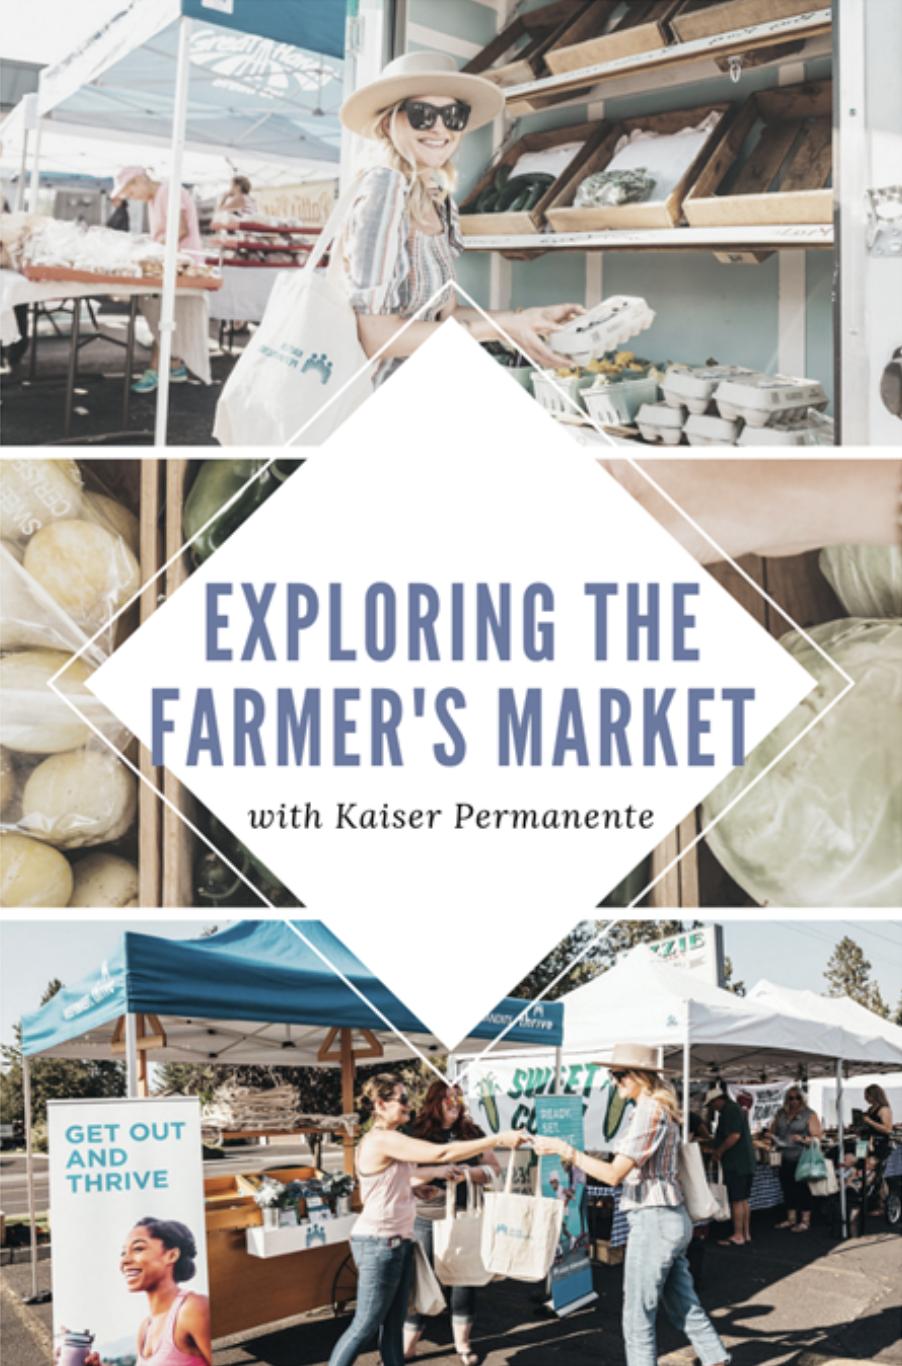 EXPLORING THE FAIRWOOD FARMER'S MARKET SPOKANE EATS